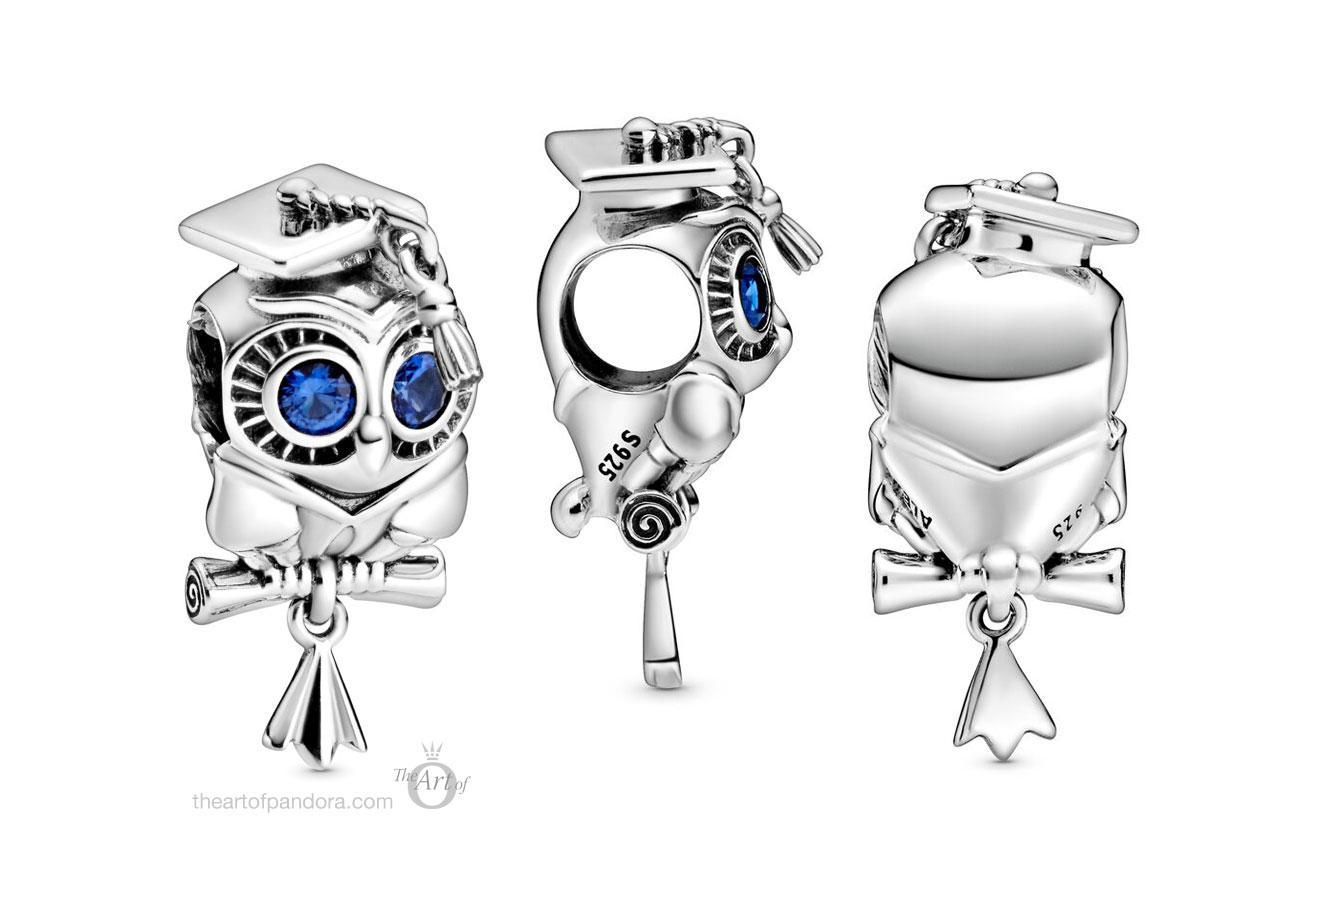 798907C01-Pandora-wise-owl-graduation-charm - The Art of Pandora ...